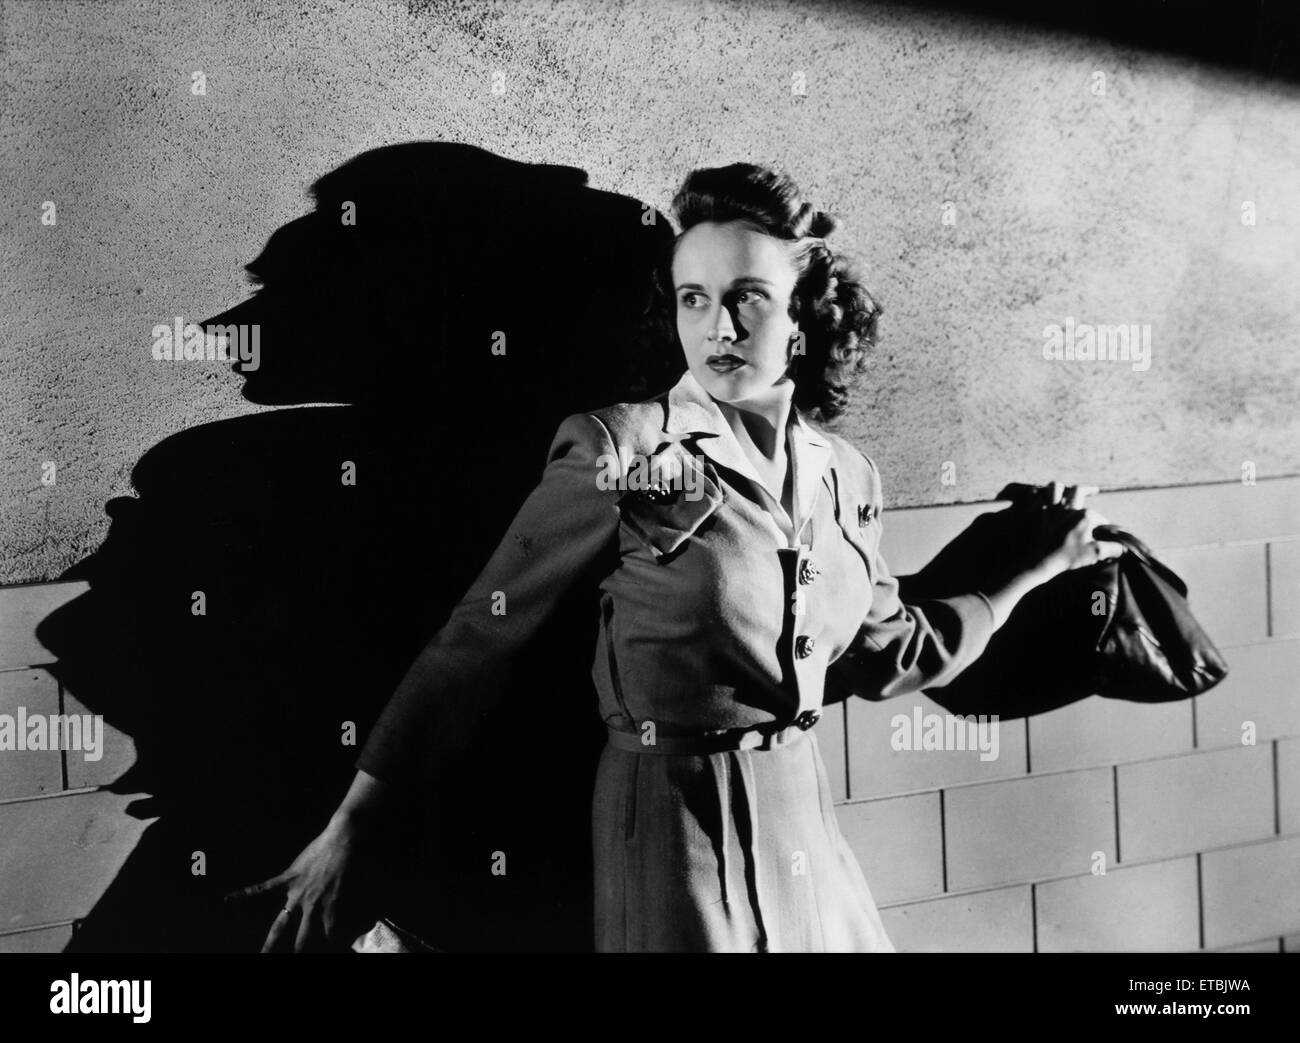 Kim Hunter, on-set of the Film 'When Strangers Marry', 1944 - Stock Image